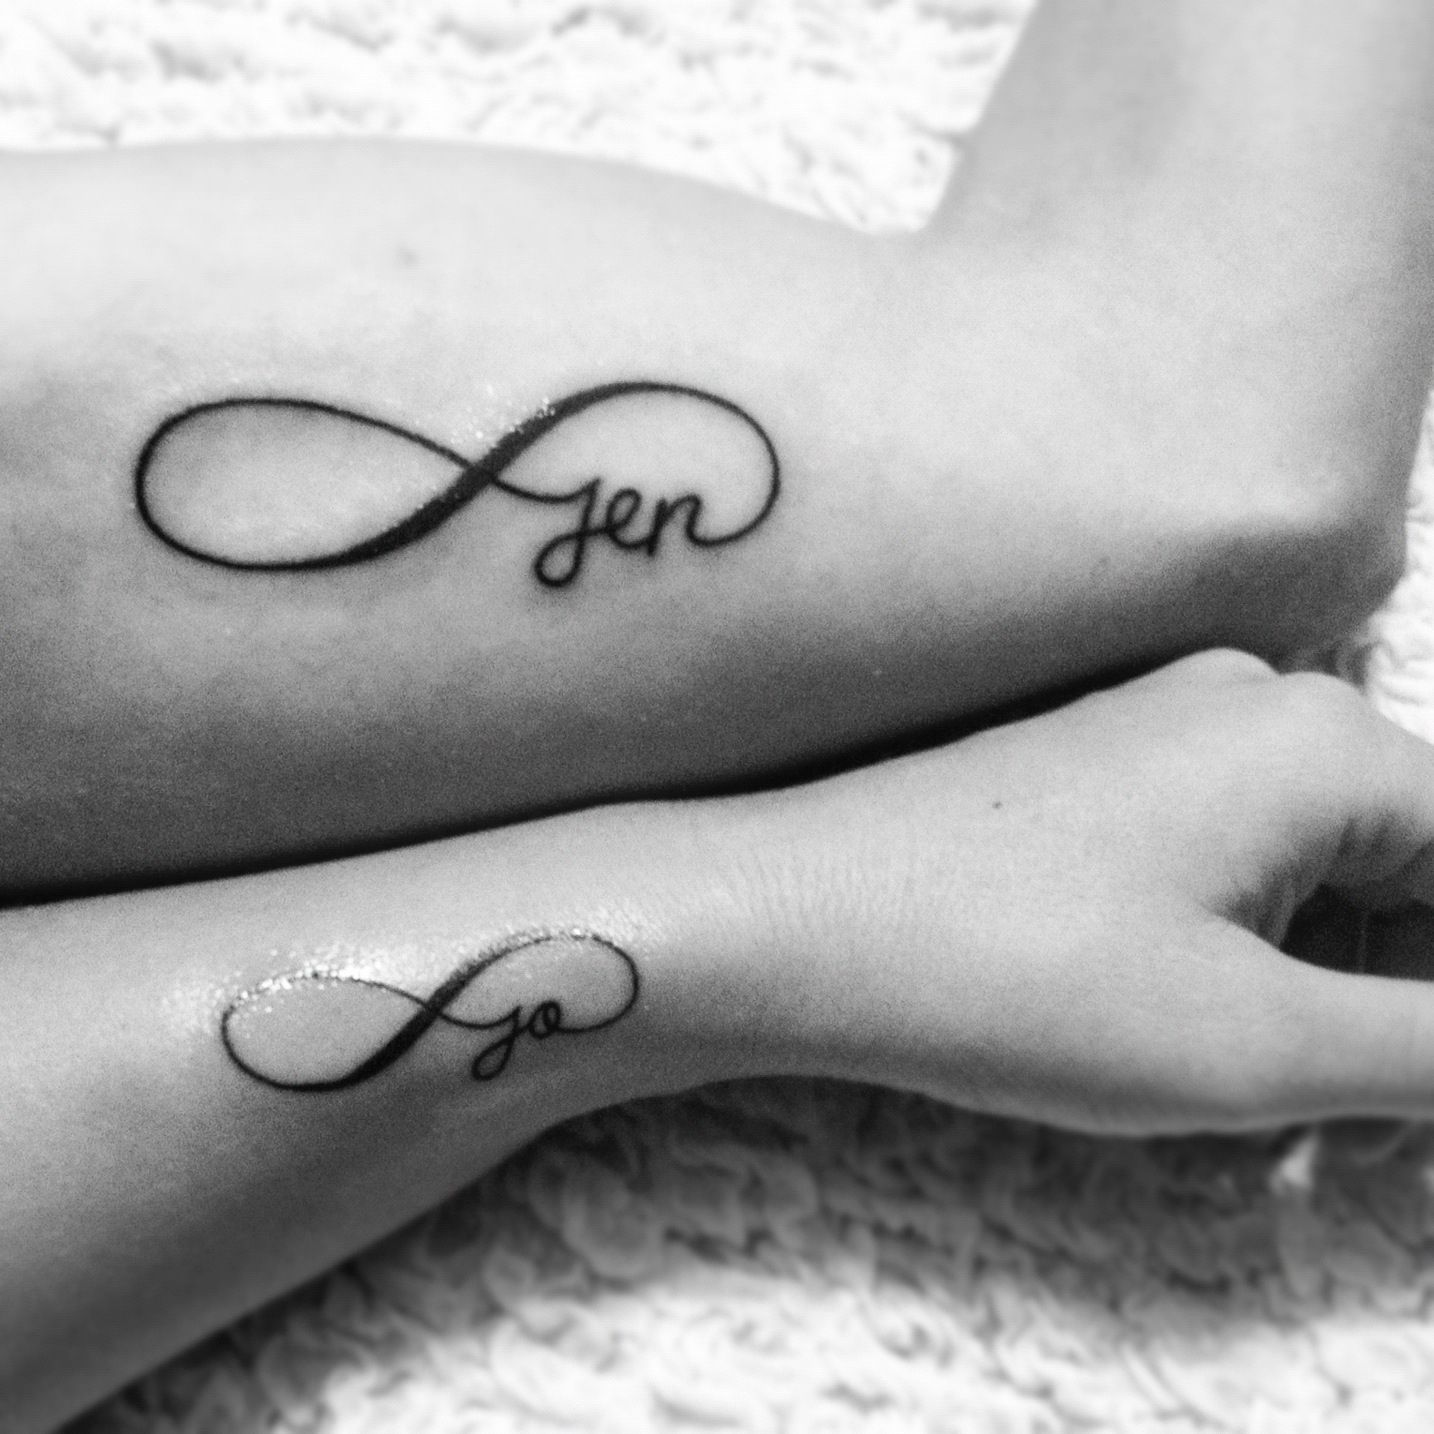 Online dating tattoos